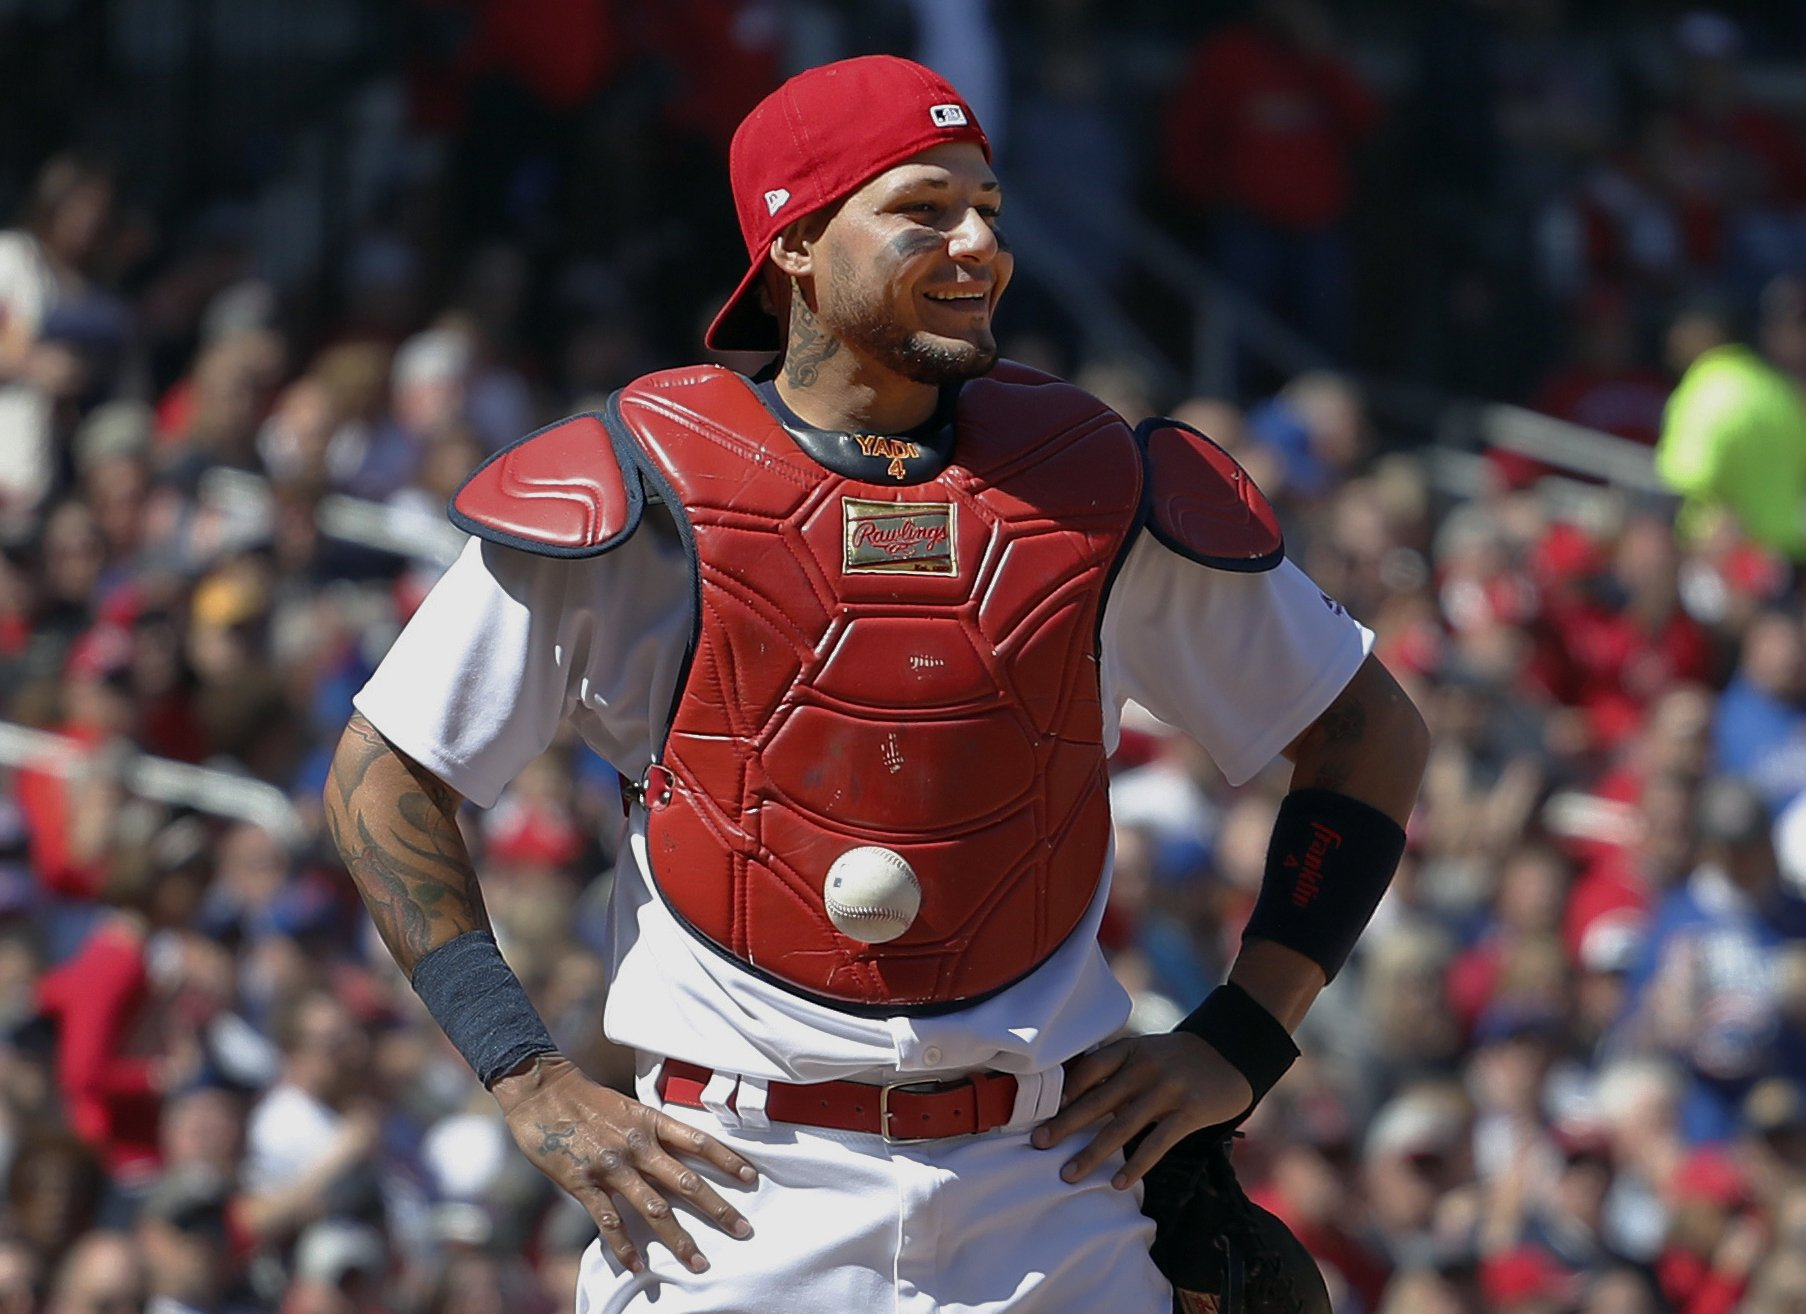 Not so sticky: MLB says no violation in Molina stuck ball